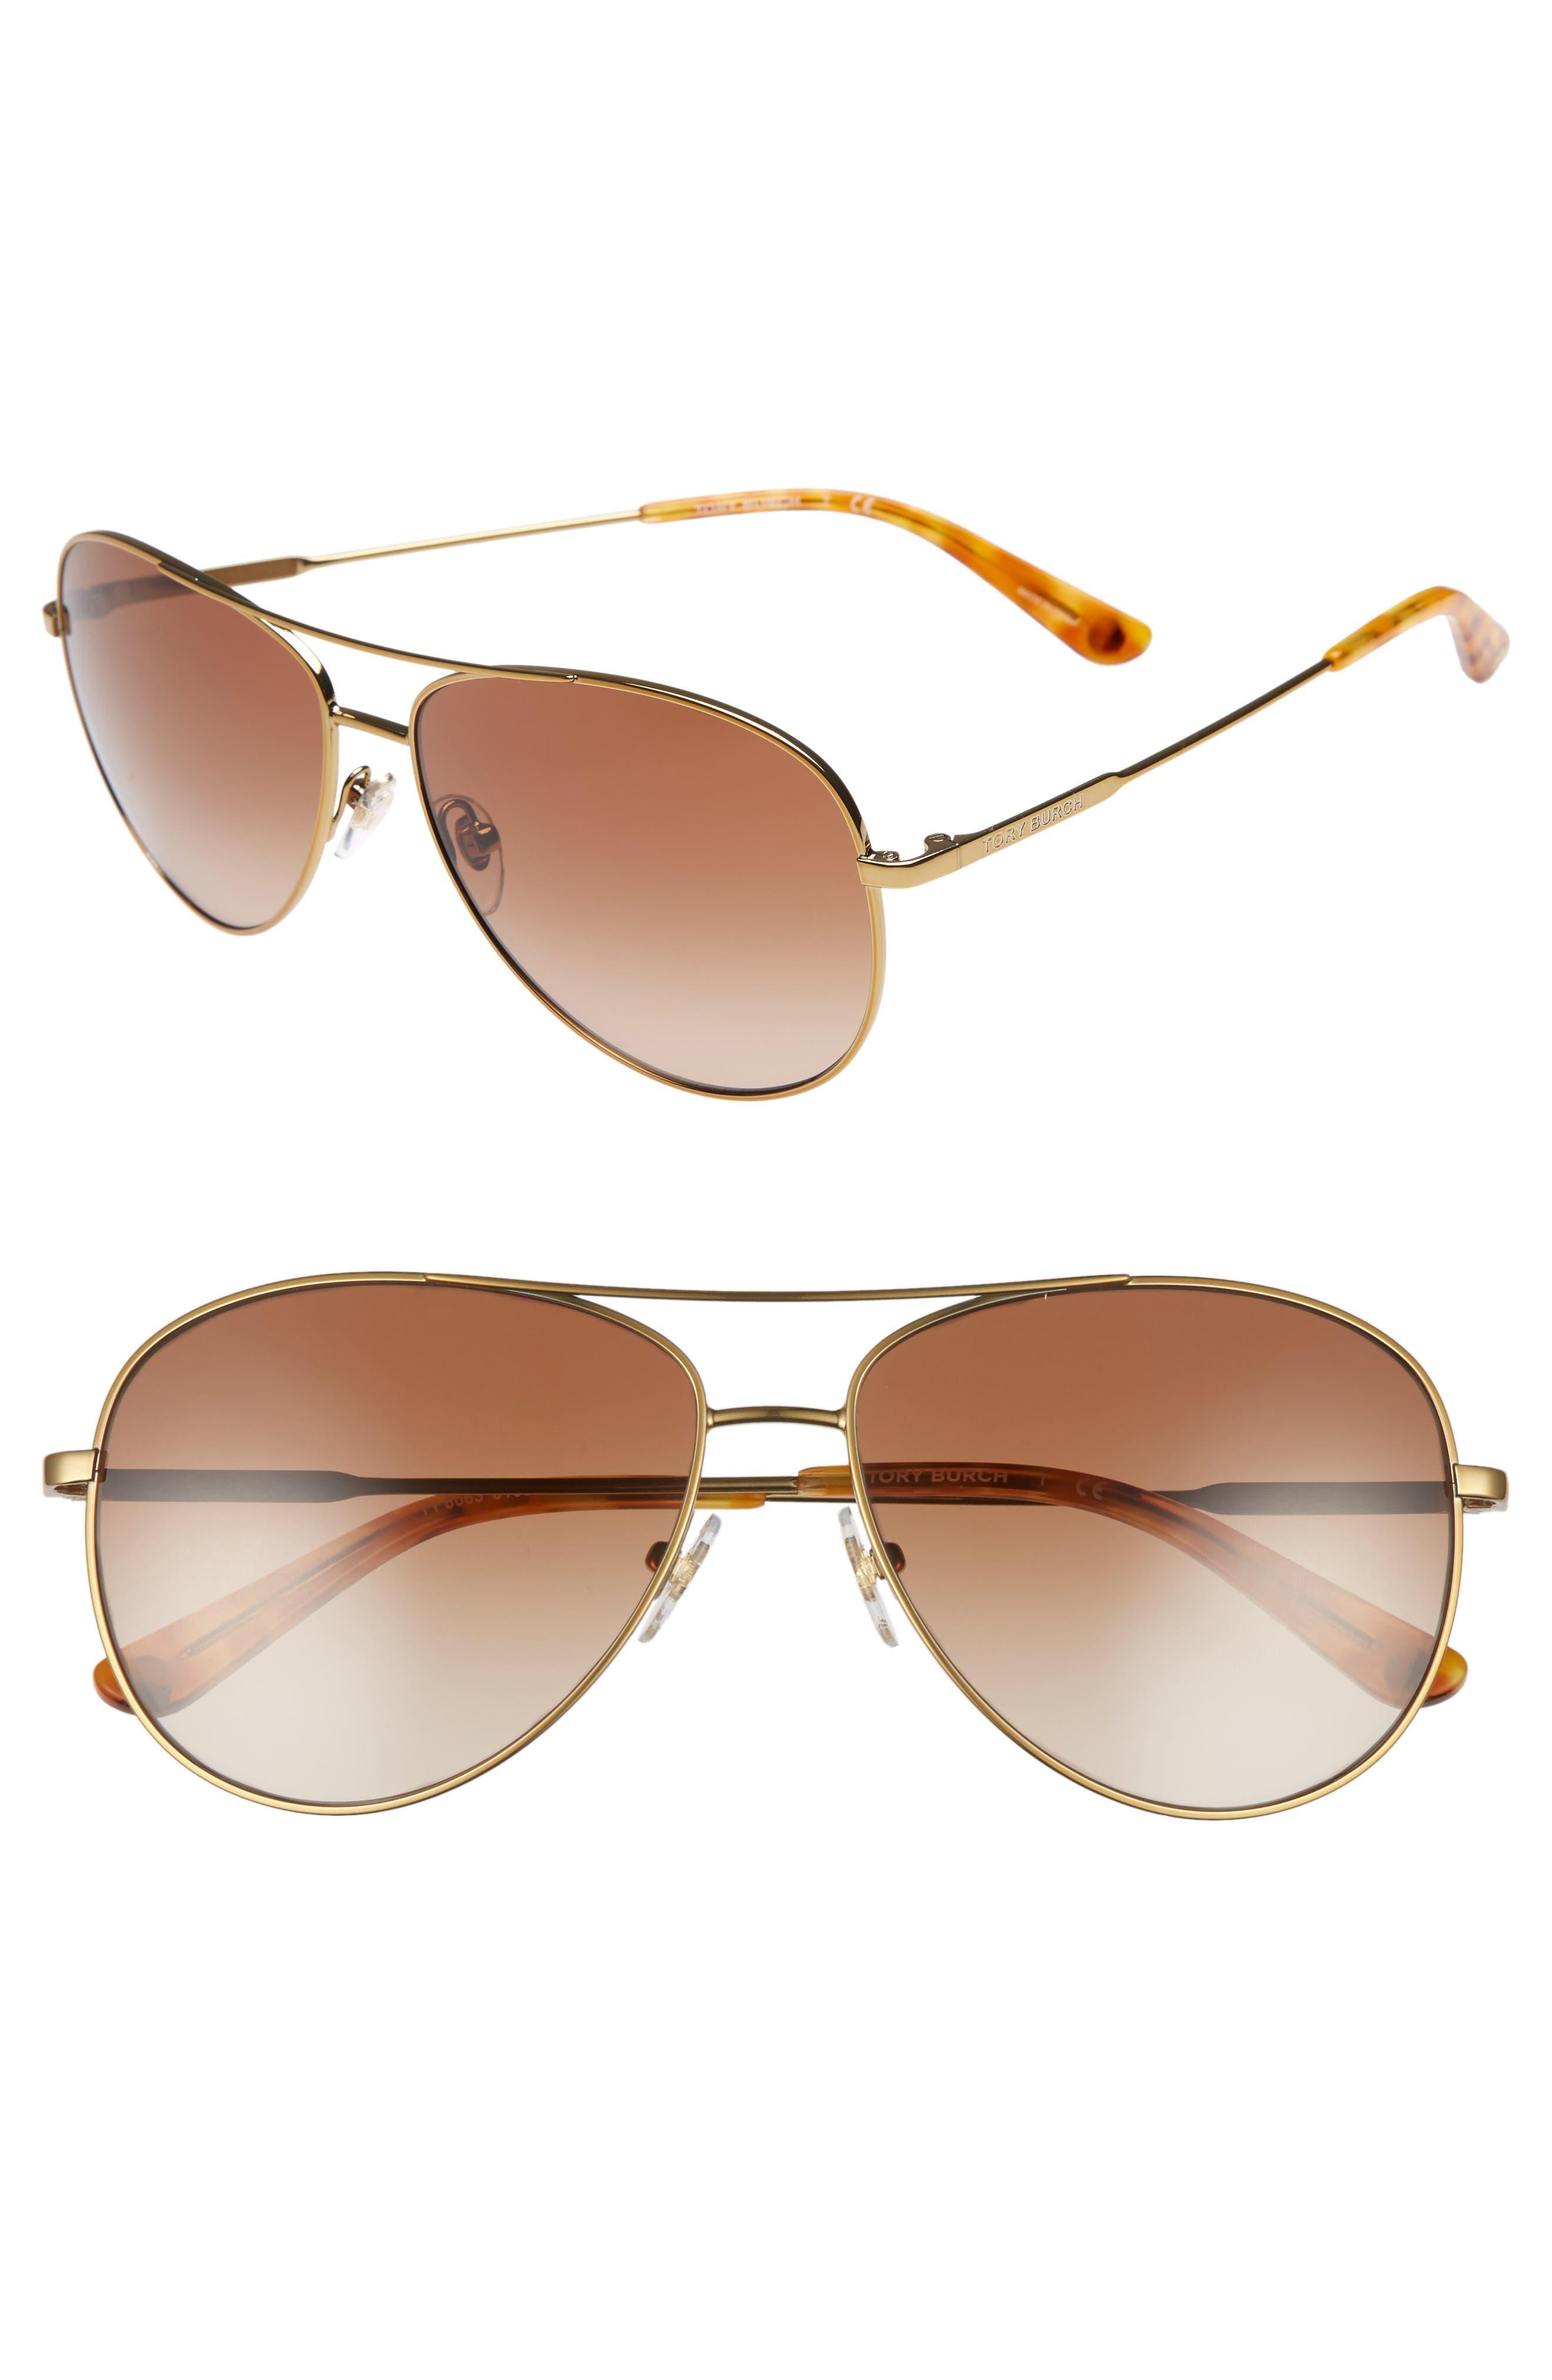 59mm Metal Aviator Sunglasses,                             Main thumbnail 1, color,                             GOLD